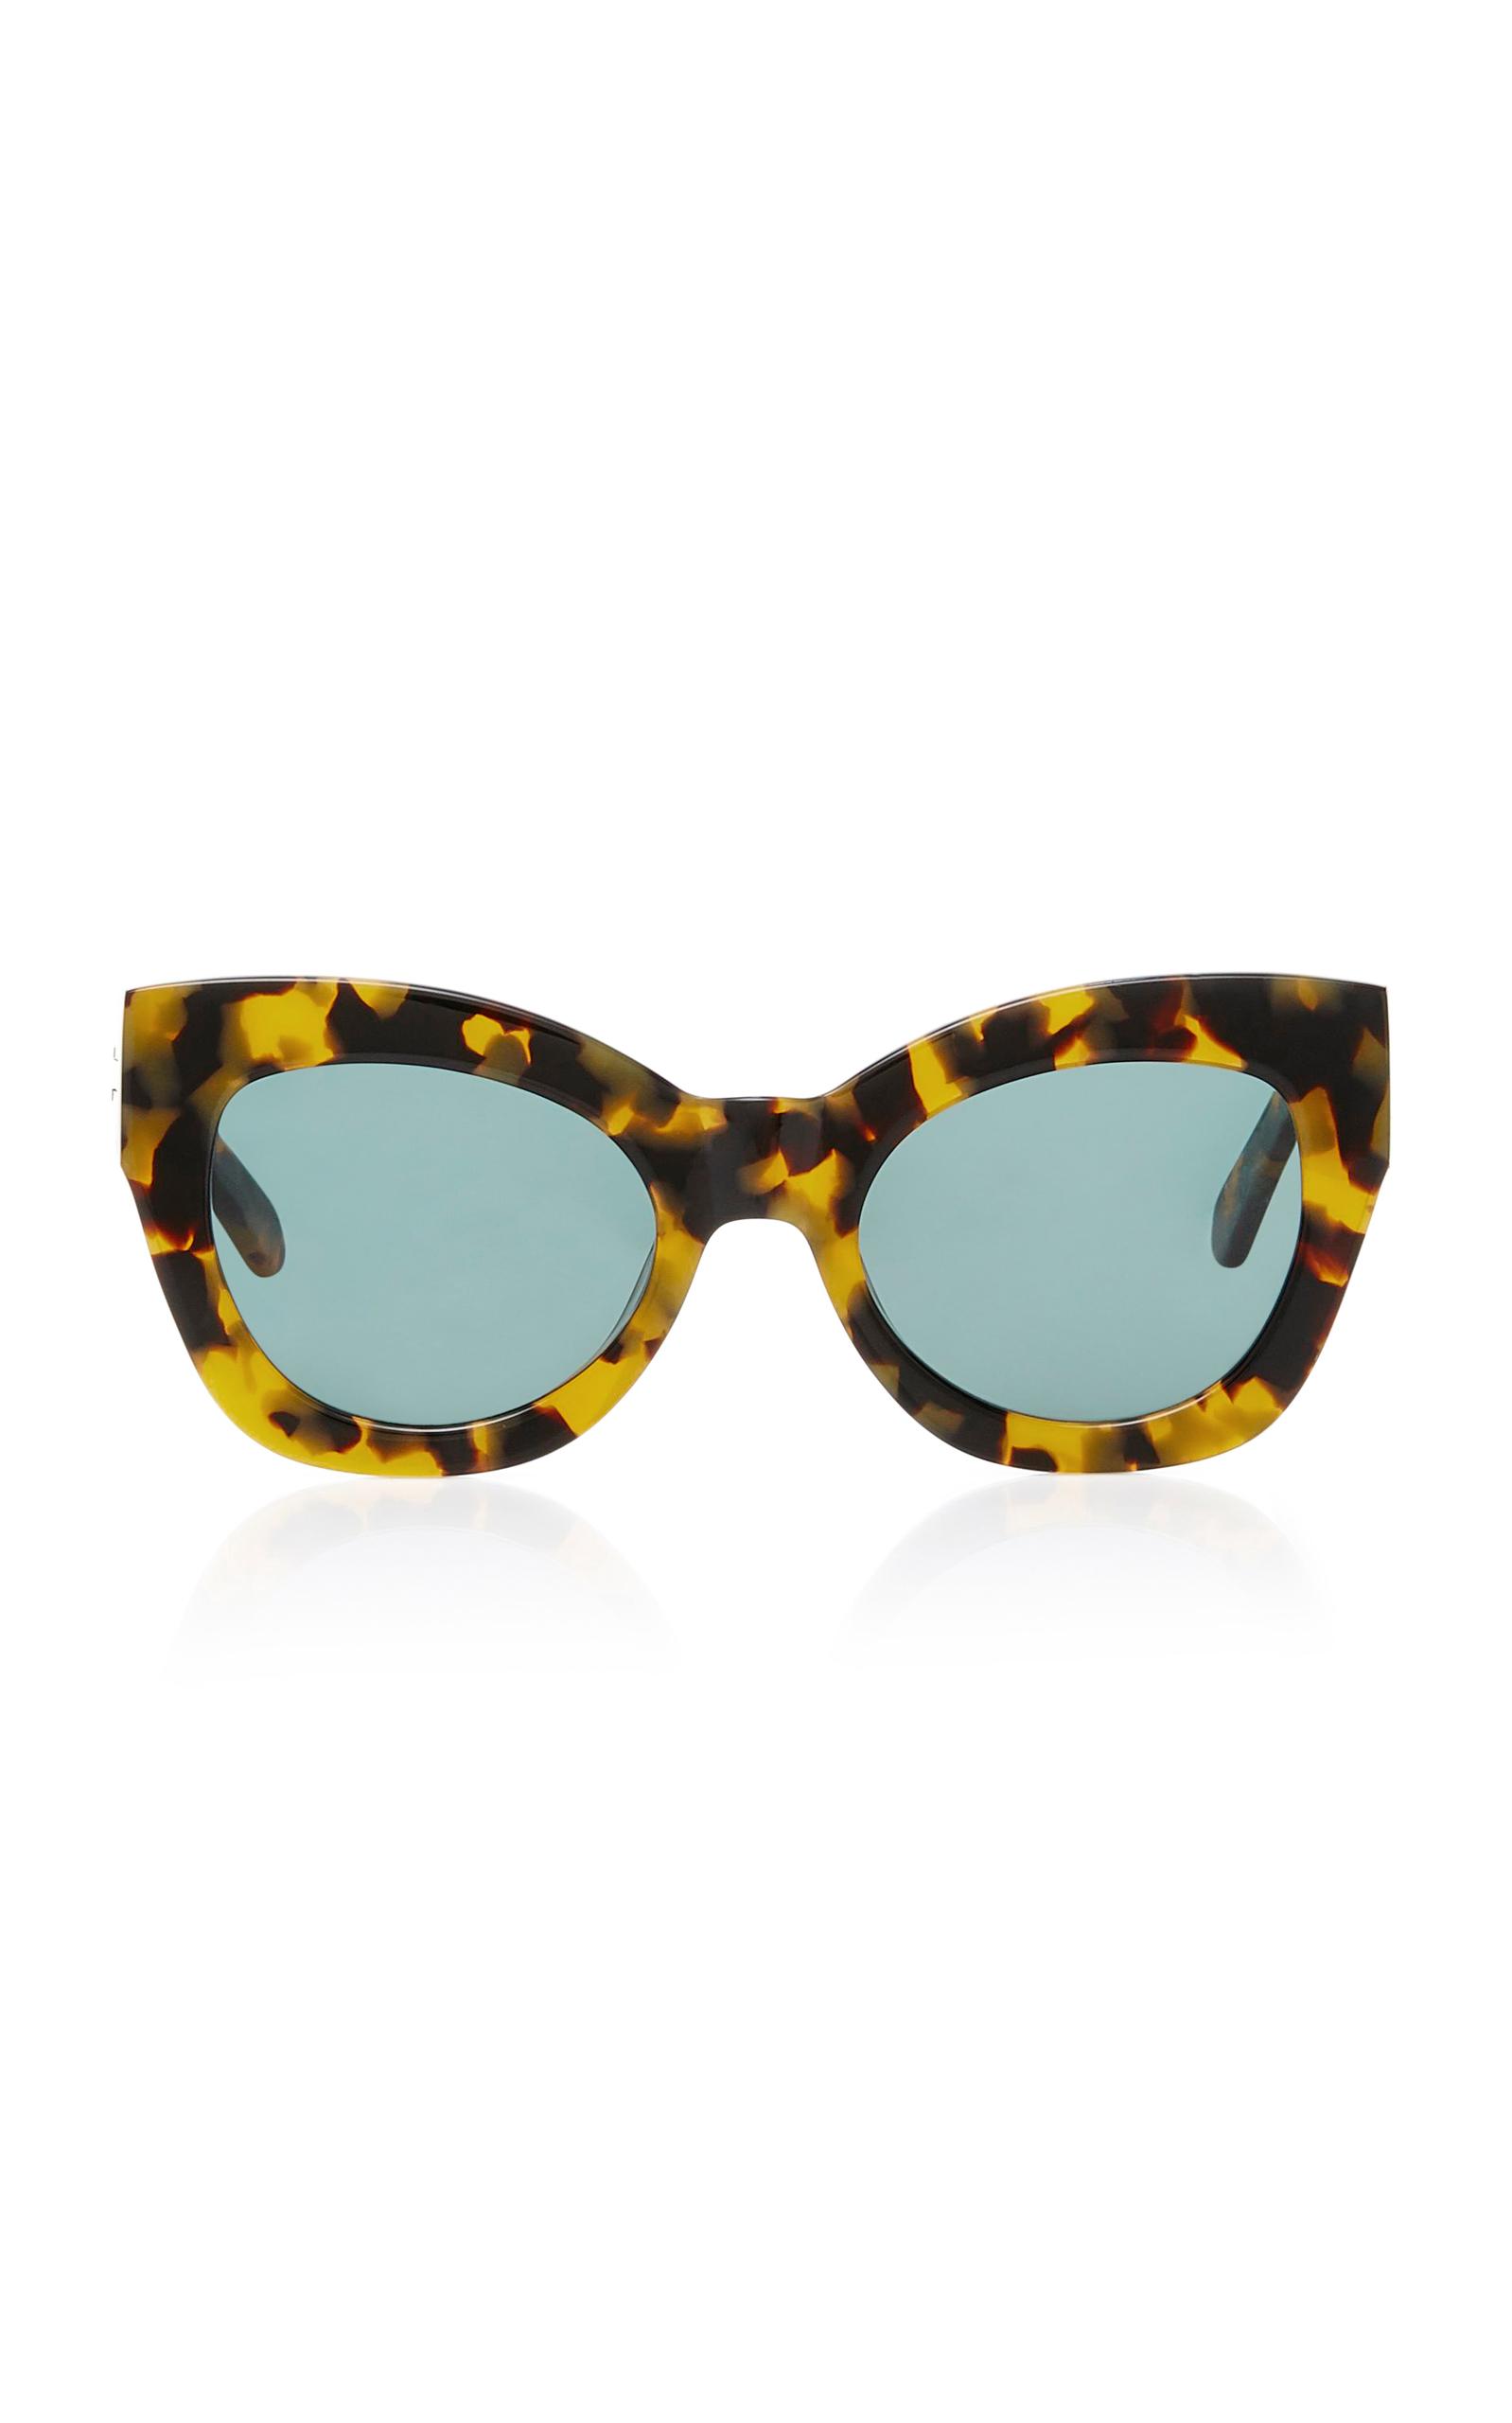 fcb76b2d630 Karen WalkerNorthern Lights Tortoiseshell Acetate Cat-Eye Sunglasses. CLOSE.  Loading